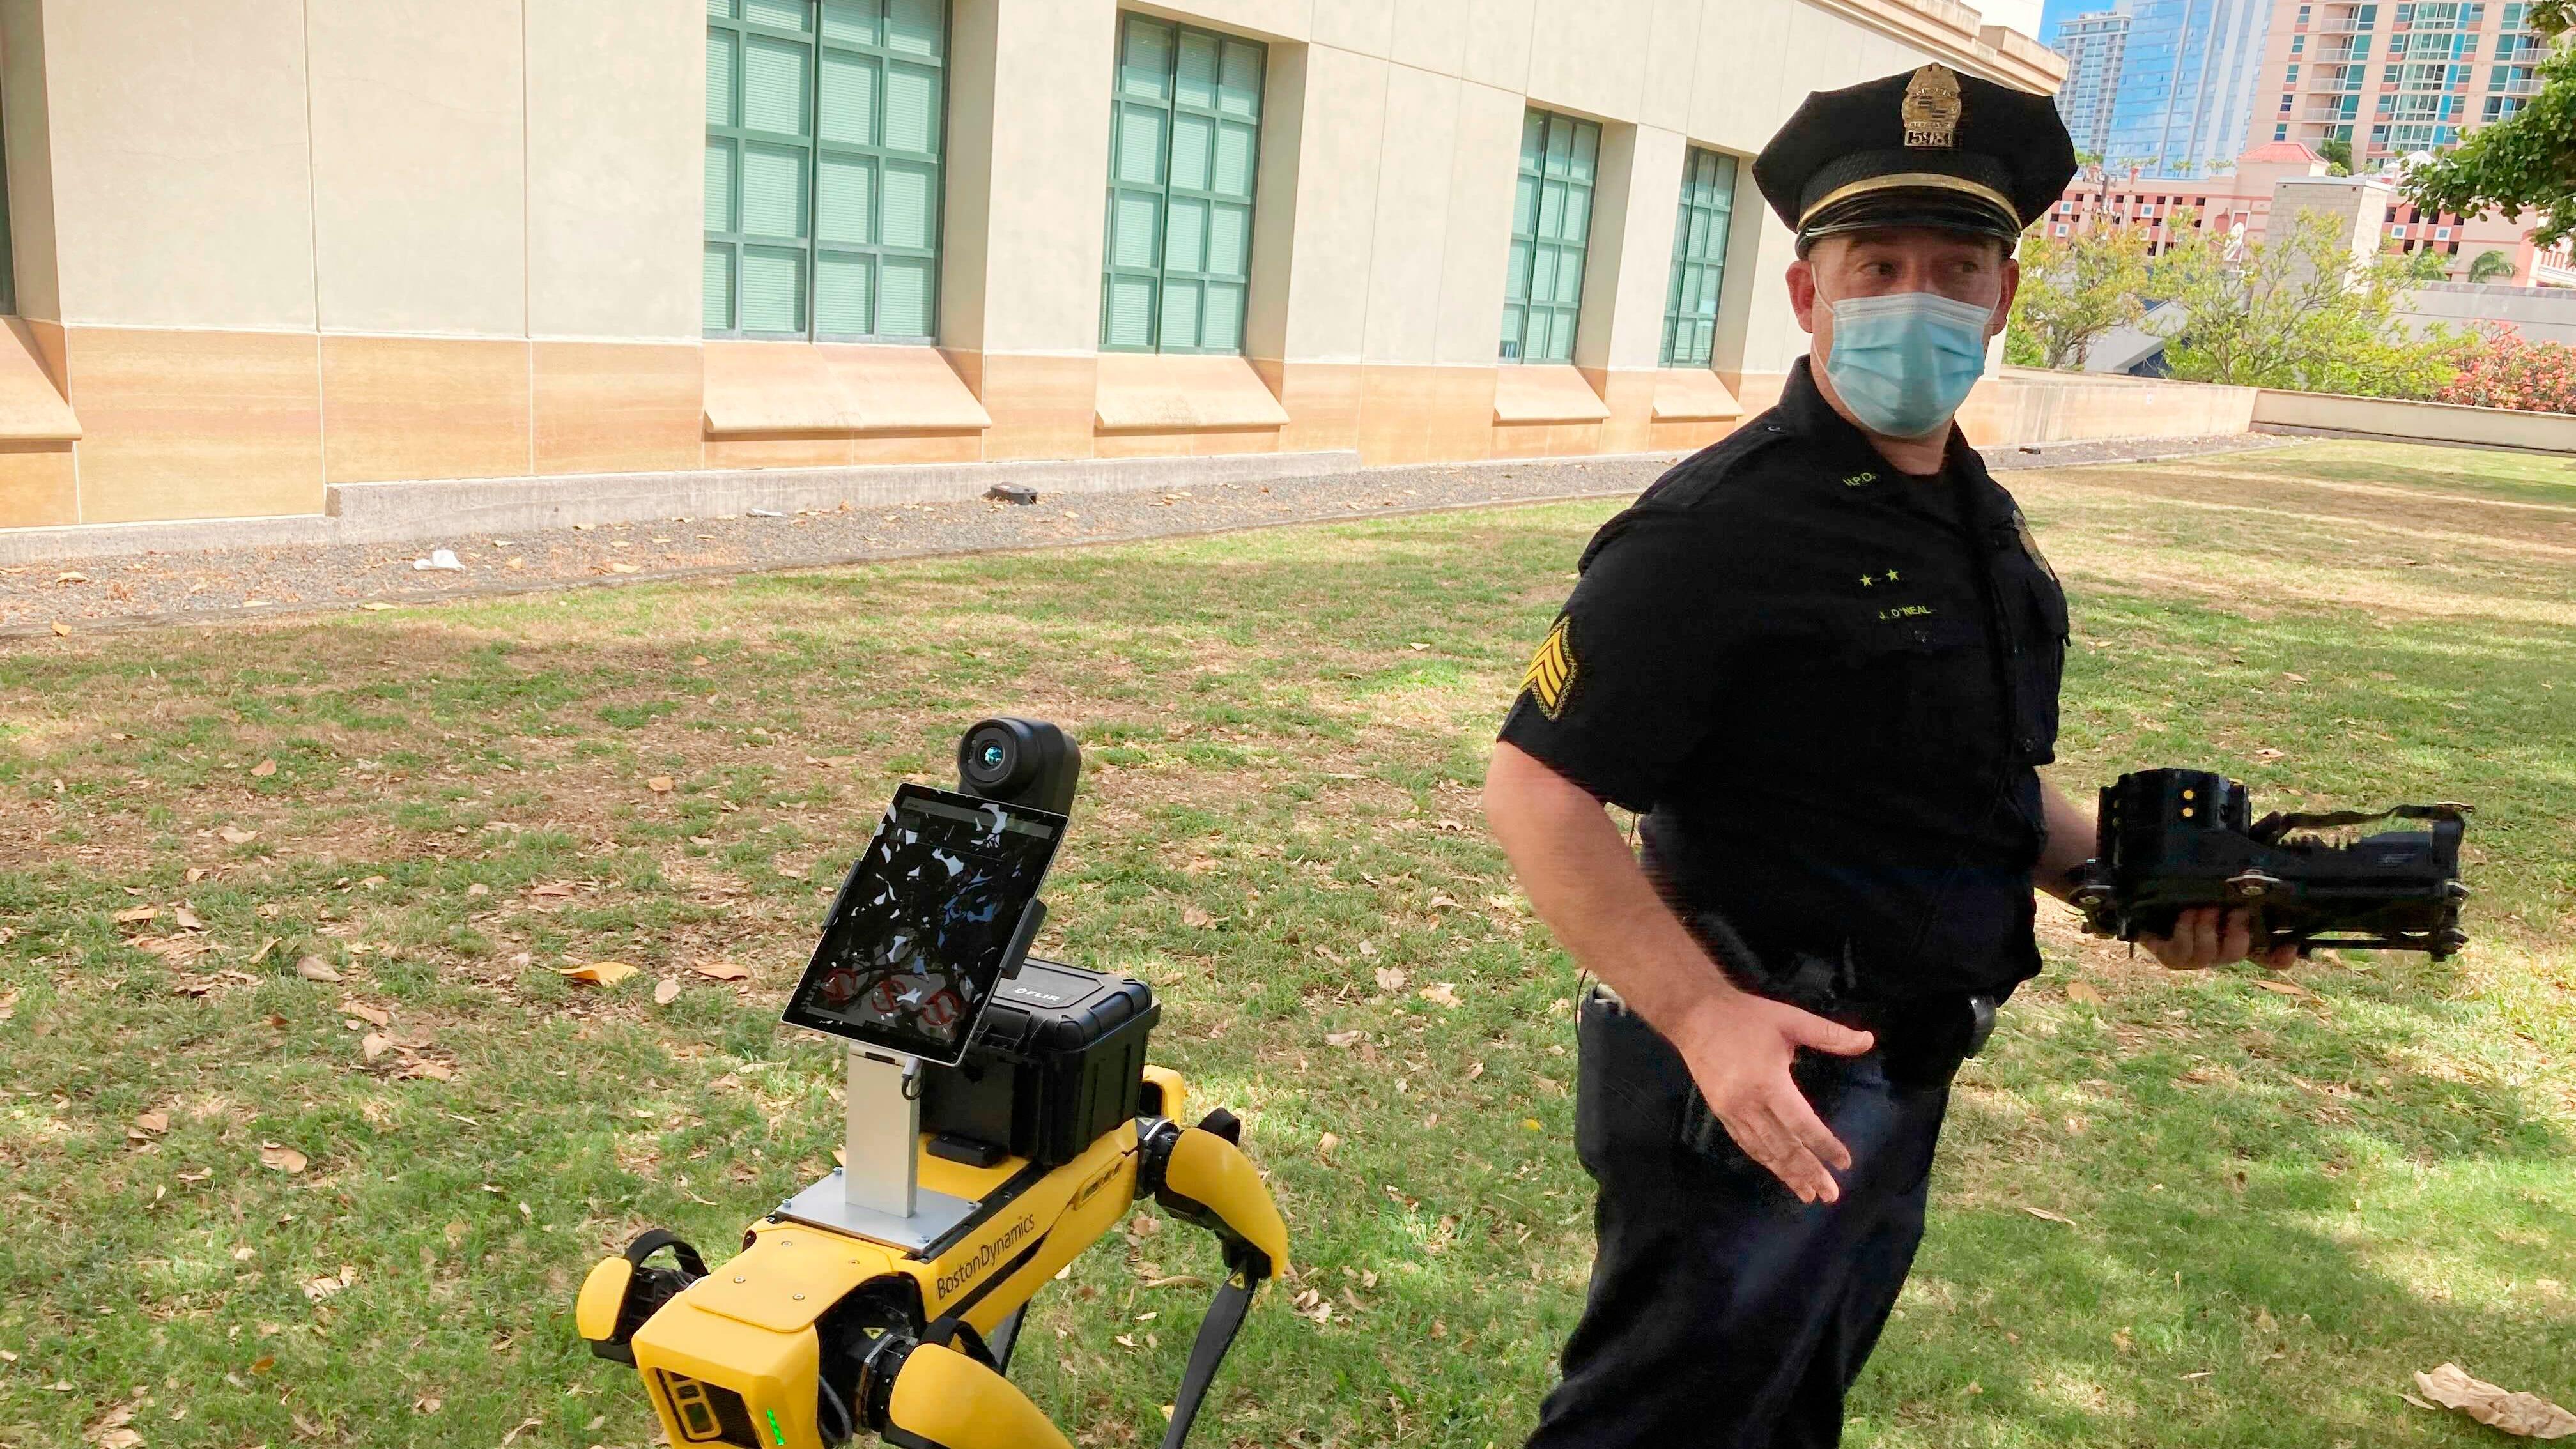 Hawaii police using robots on patrol during COVID